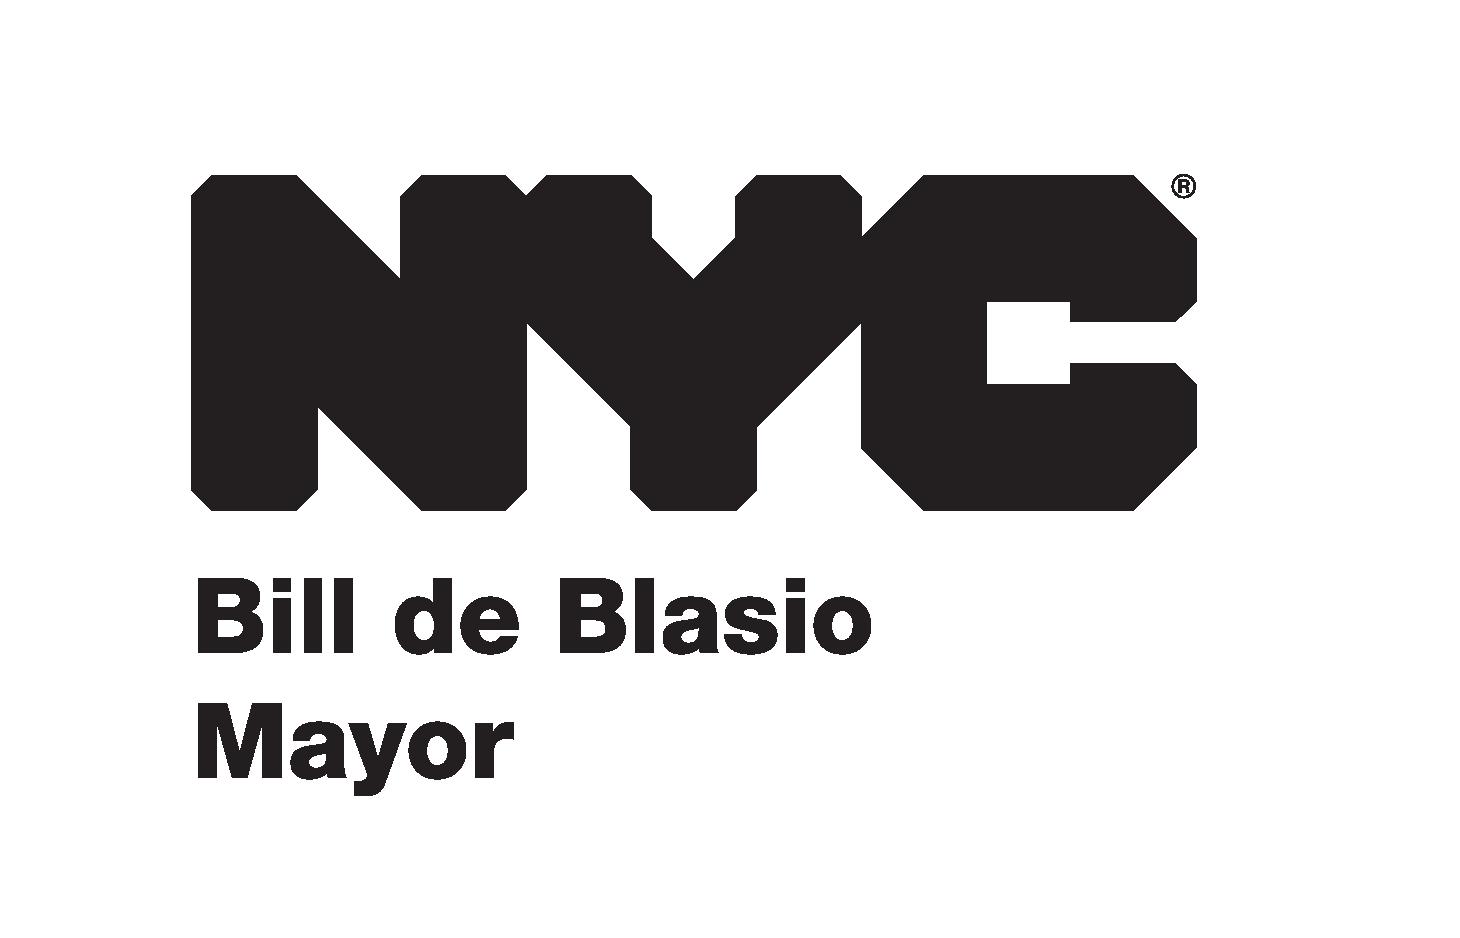 New York City office of Mayor Bill de Blasio logo